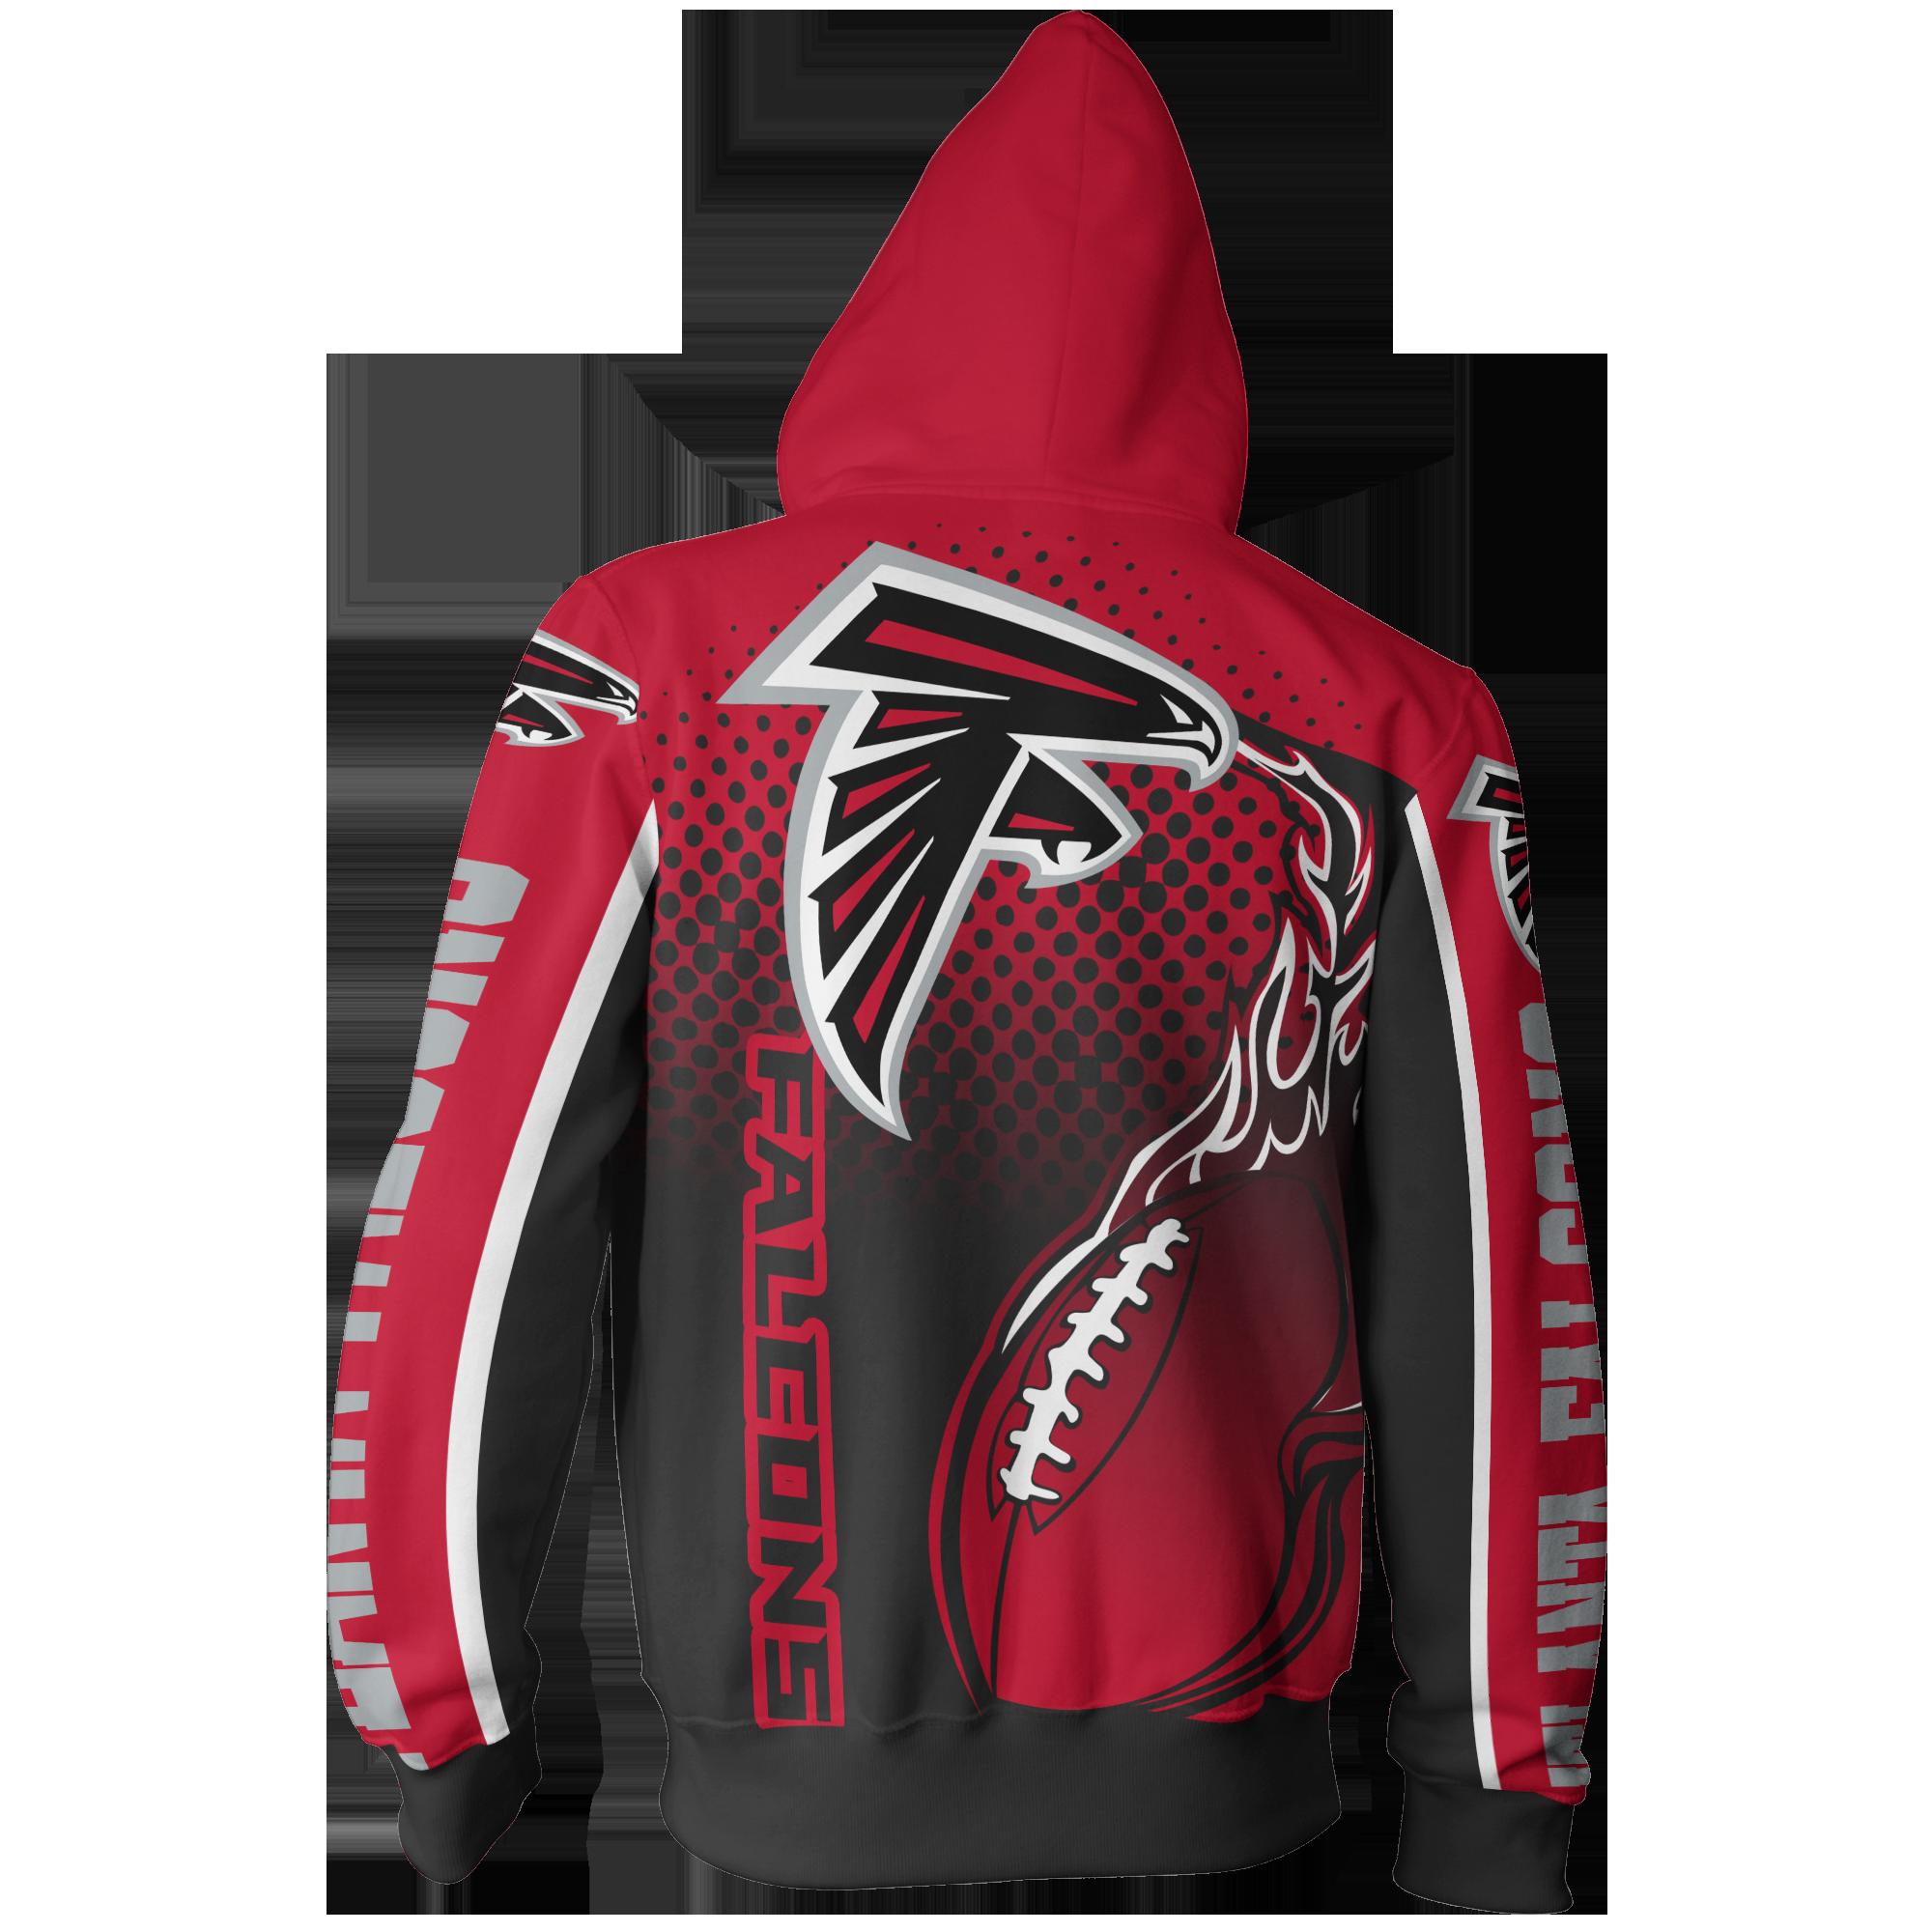 Men Women Atlanta Falcons 3d Zipper Hoodie Atlanta Falcons Zipper Hoodie Nfl Atlanta Falc Atlanta Falcons Clothes Atlanta Falcons Atlanta Falcons Hoodie